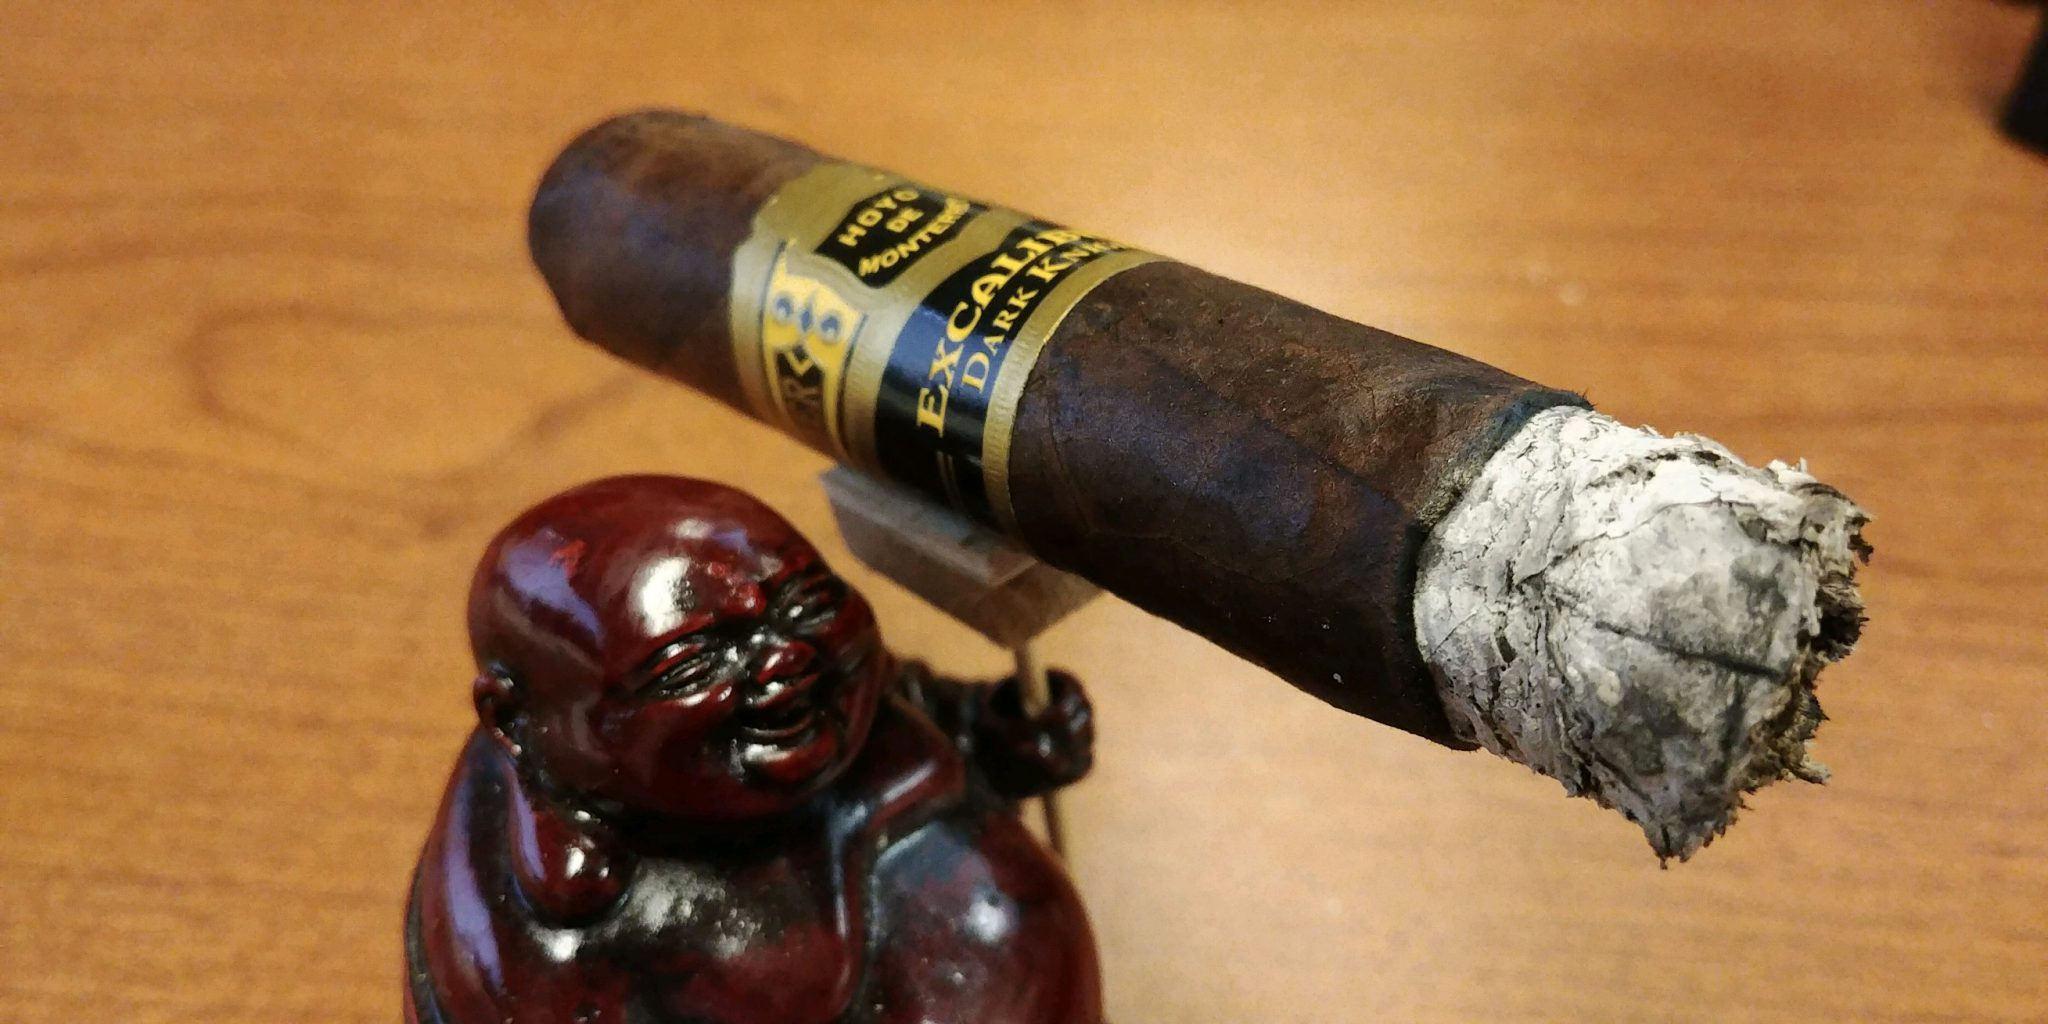 hoyo de monterrey excalibur dark knight cigar review jp